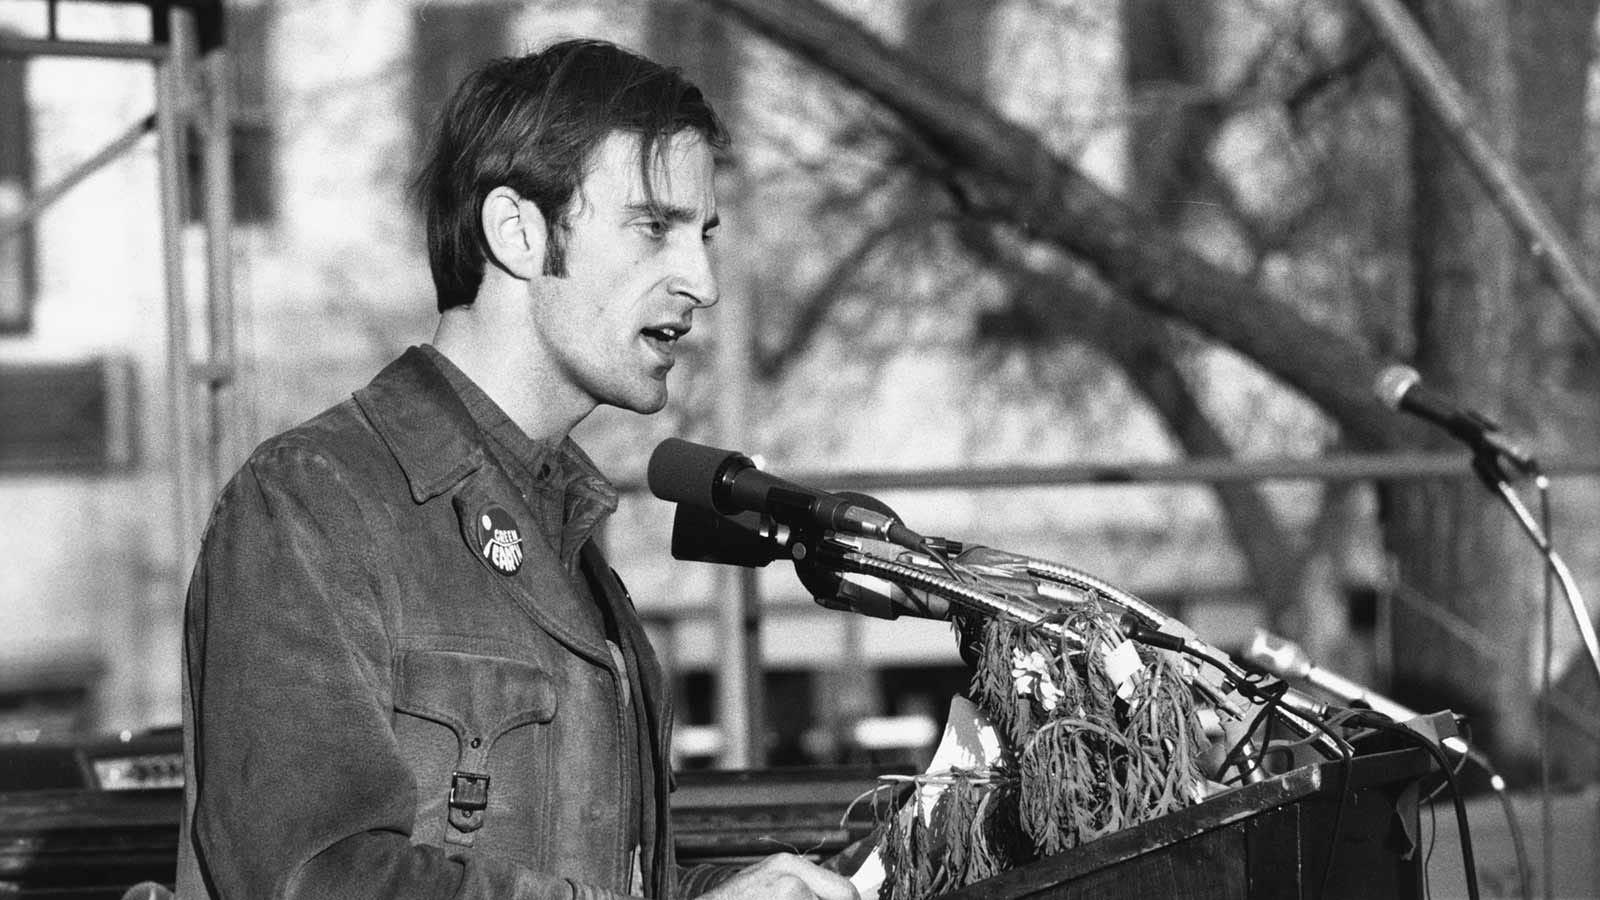 Denis Hayes speaking at a podium.